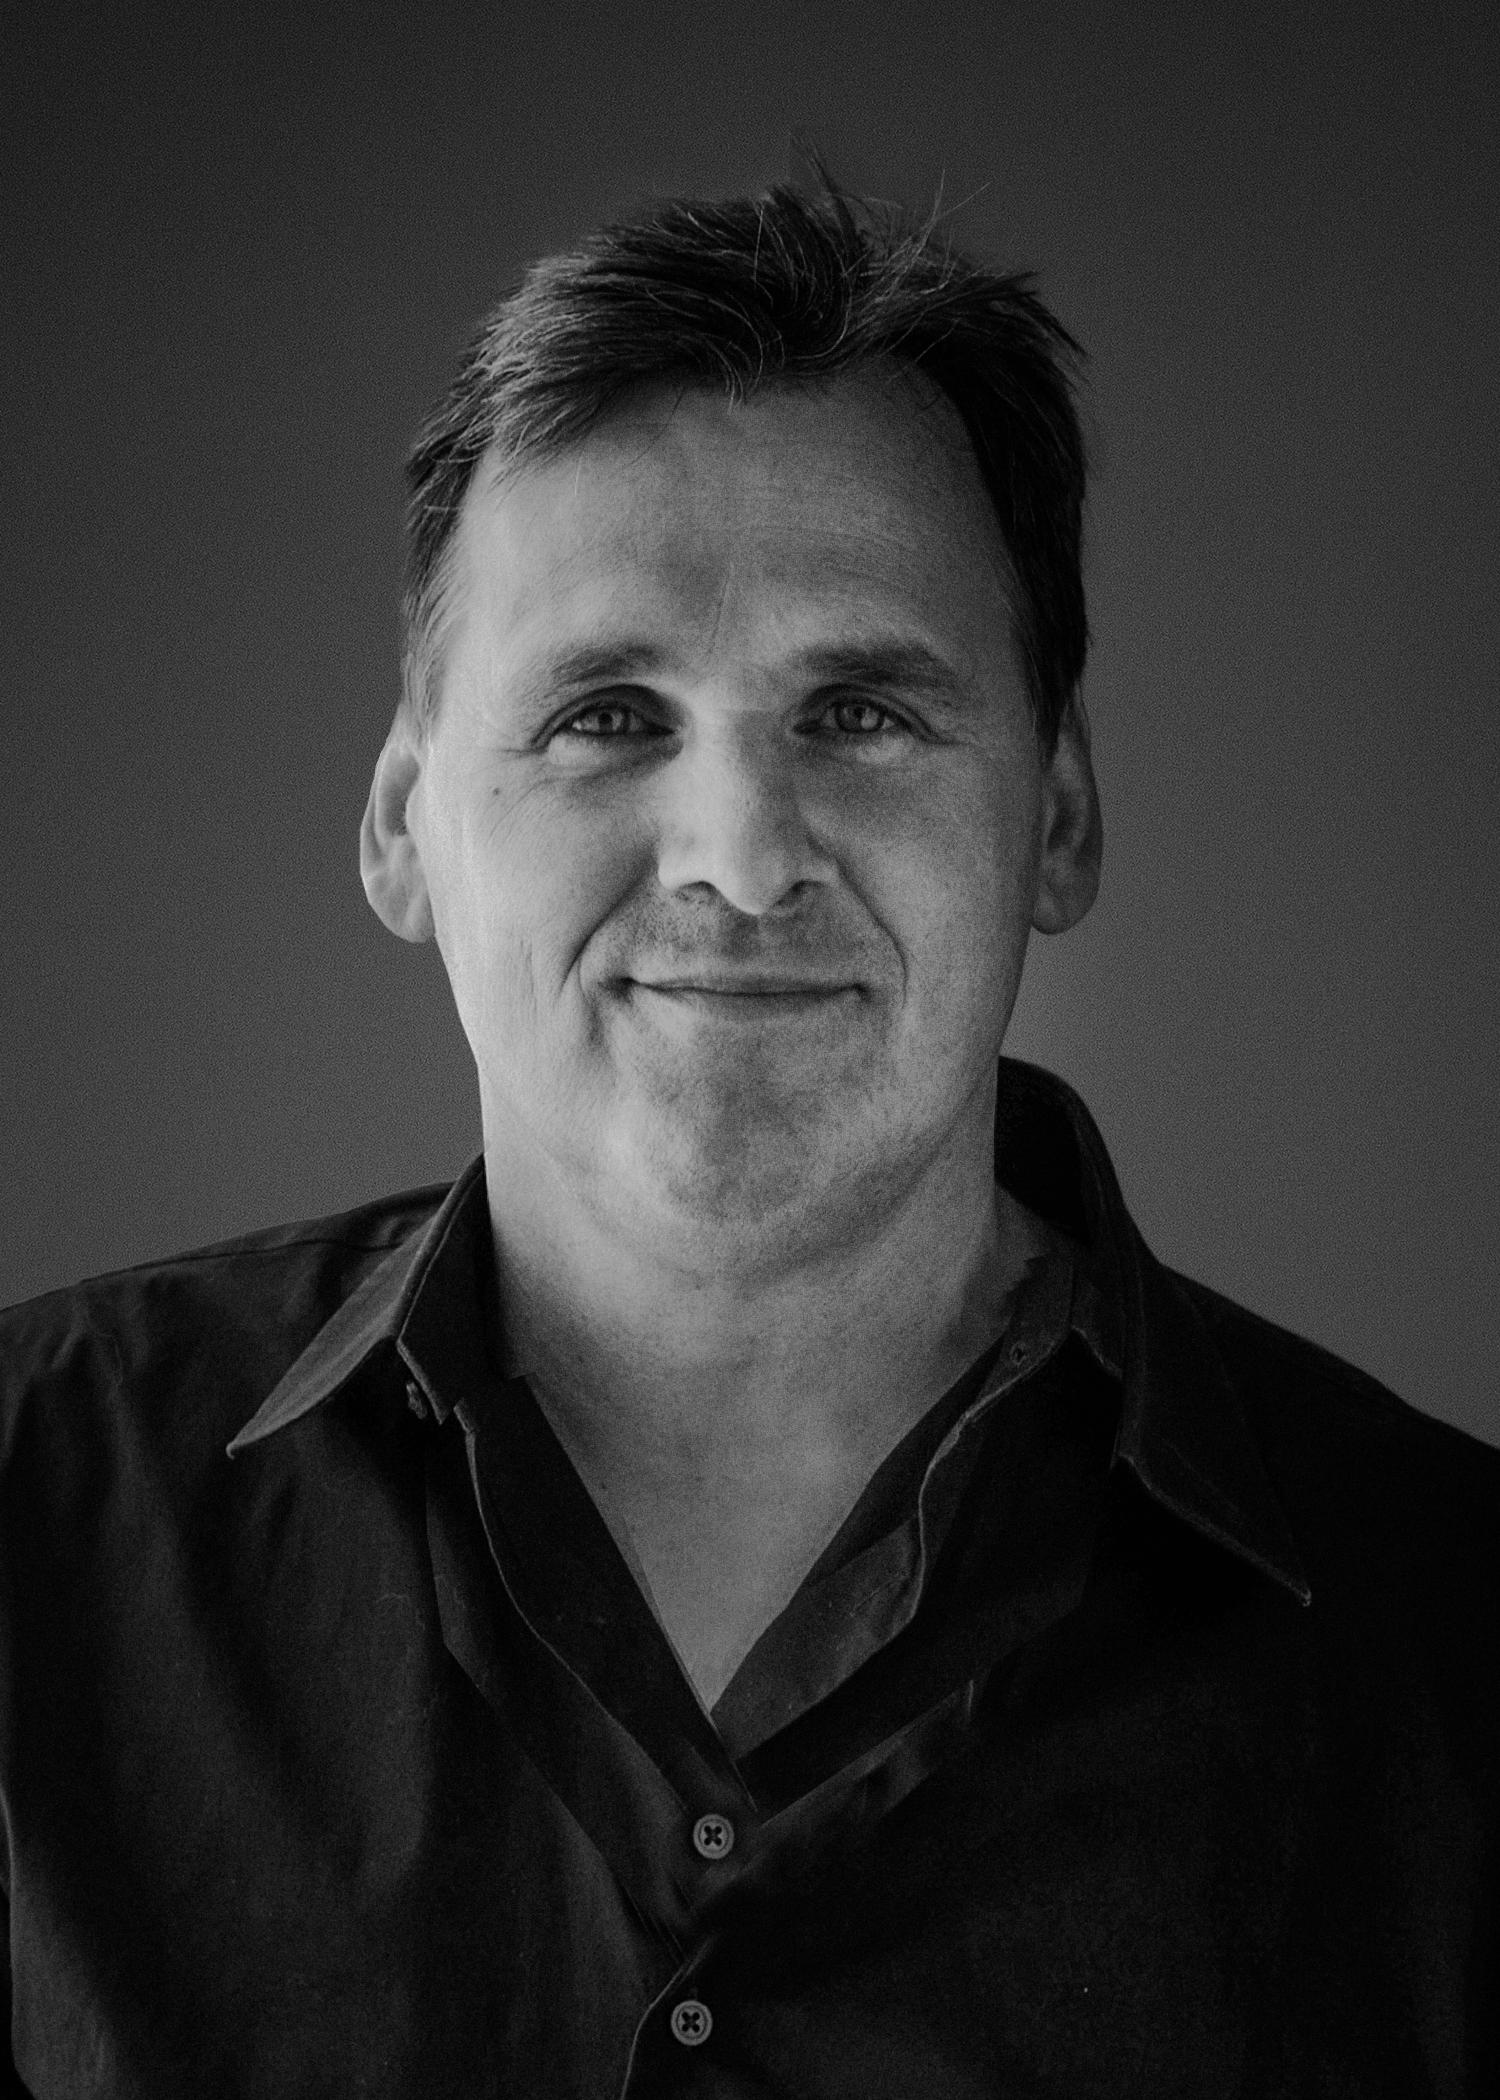 Mike Kirkland, Creative Director